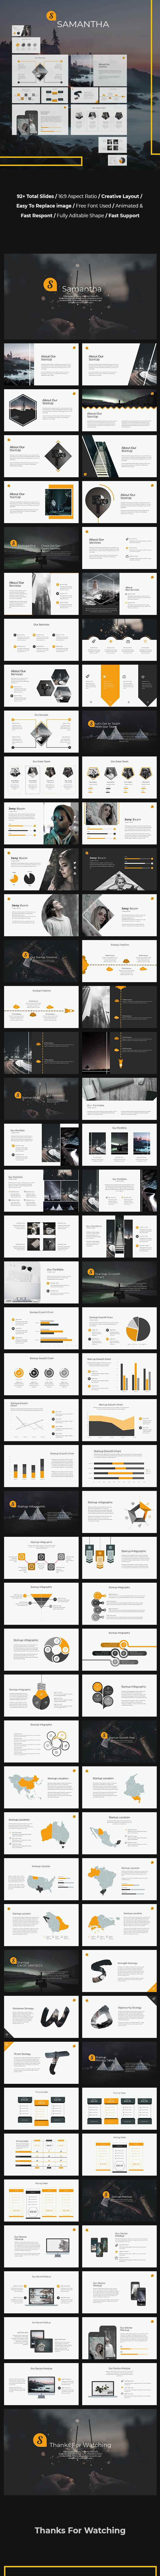 Samantha – Creative Powerpoint Template - Creative PowerPoint Templates